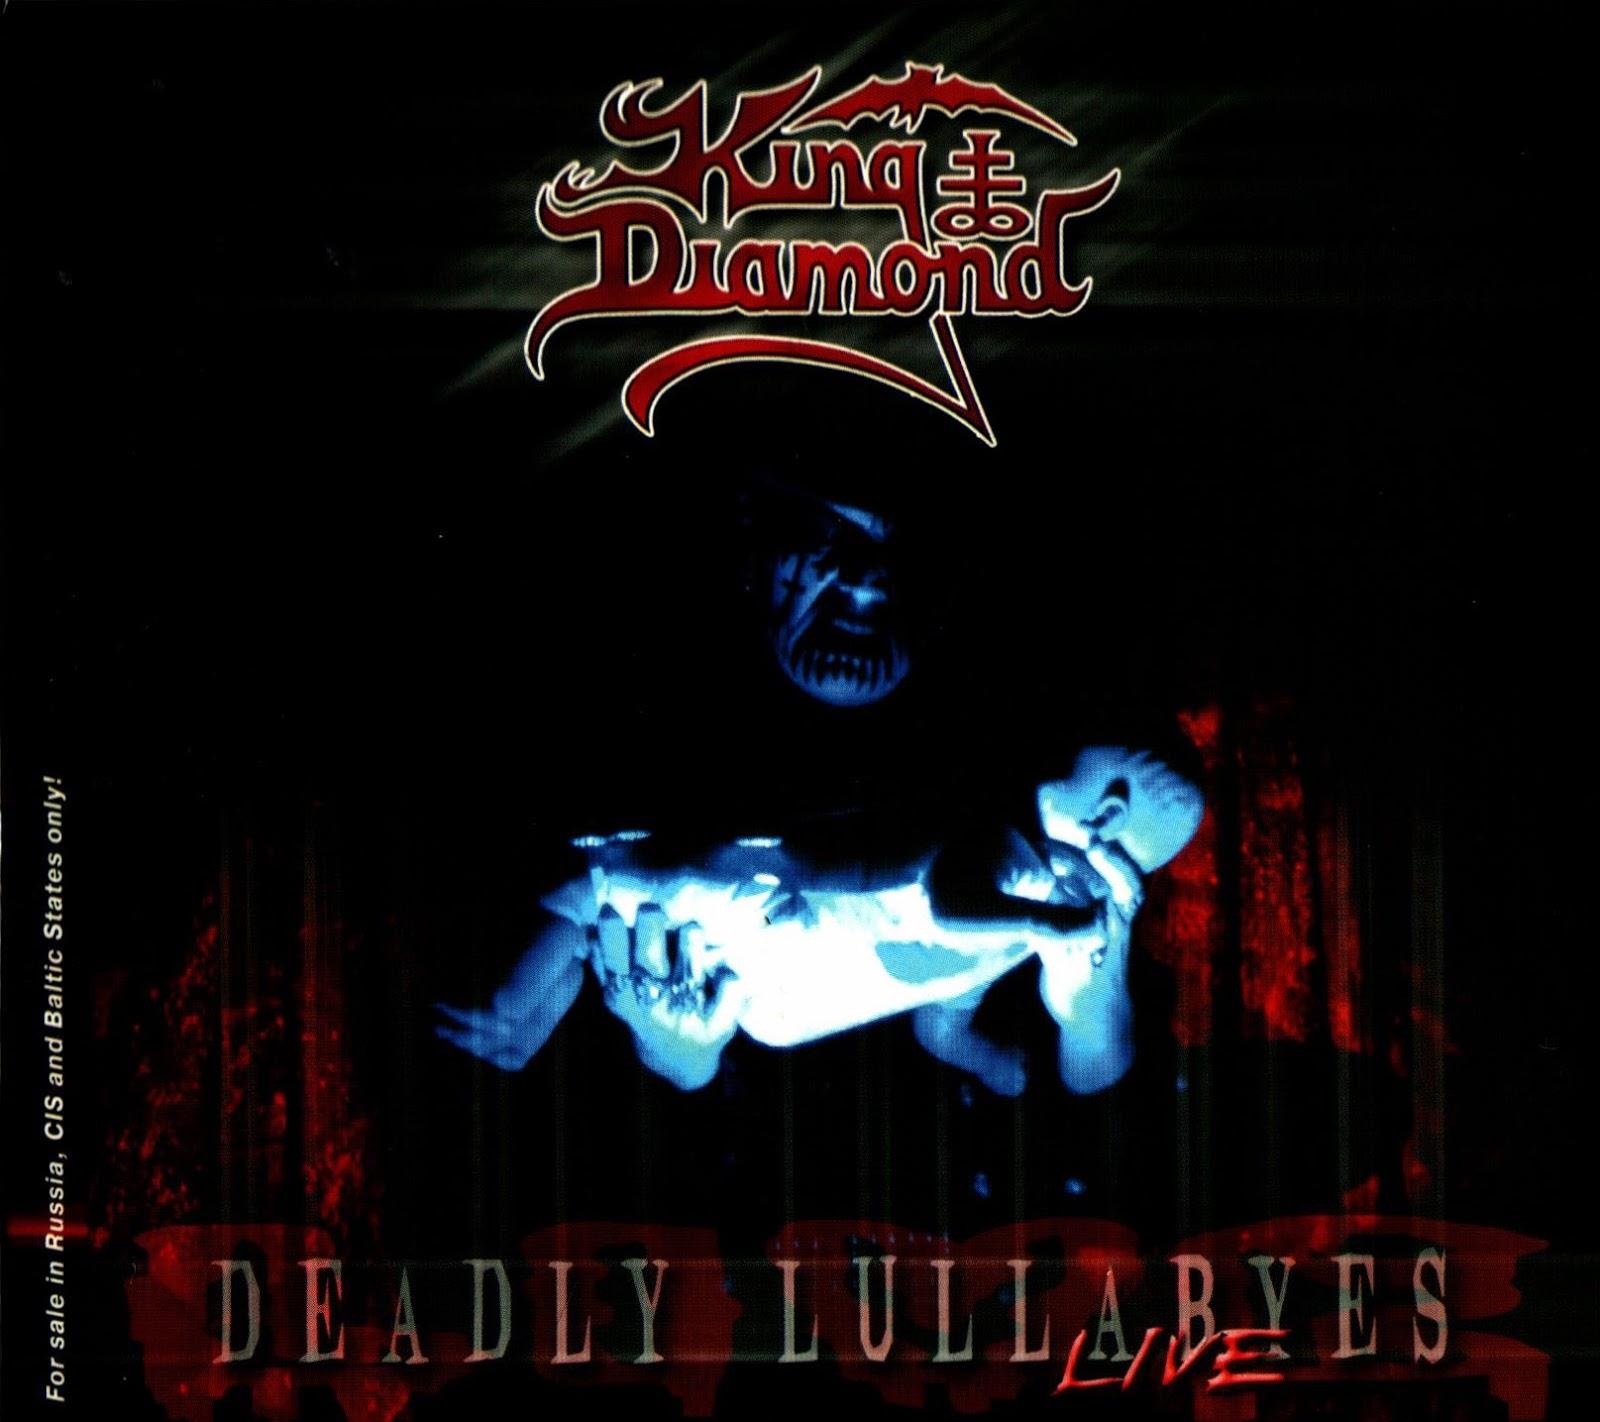 King Diamond — Deadly Lullabyes — Live (2004)